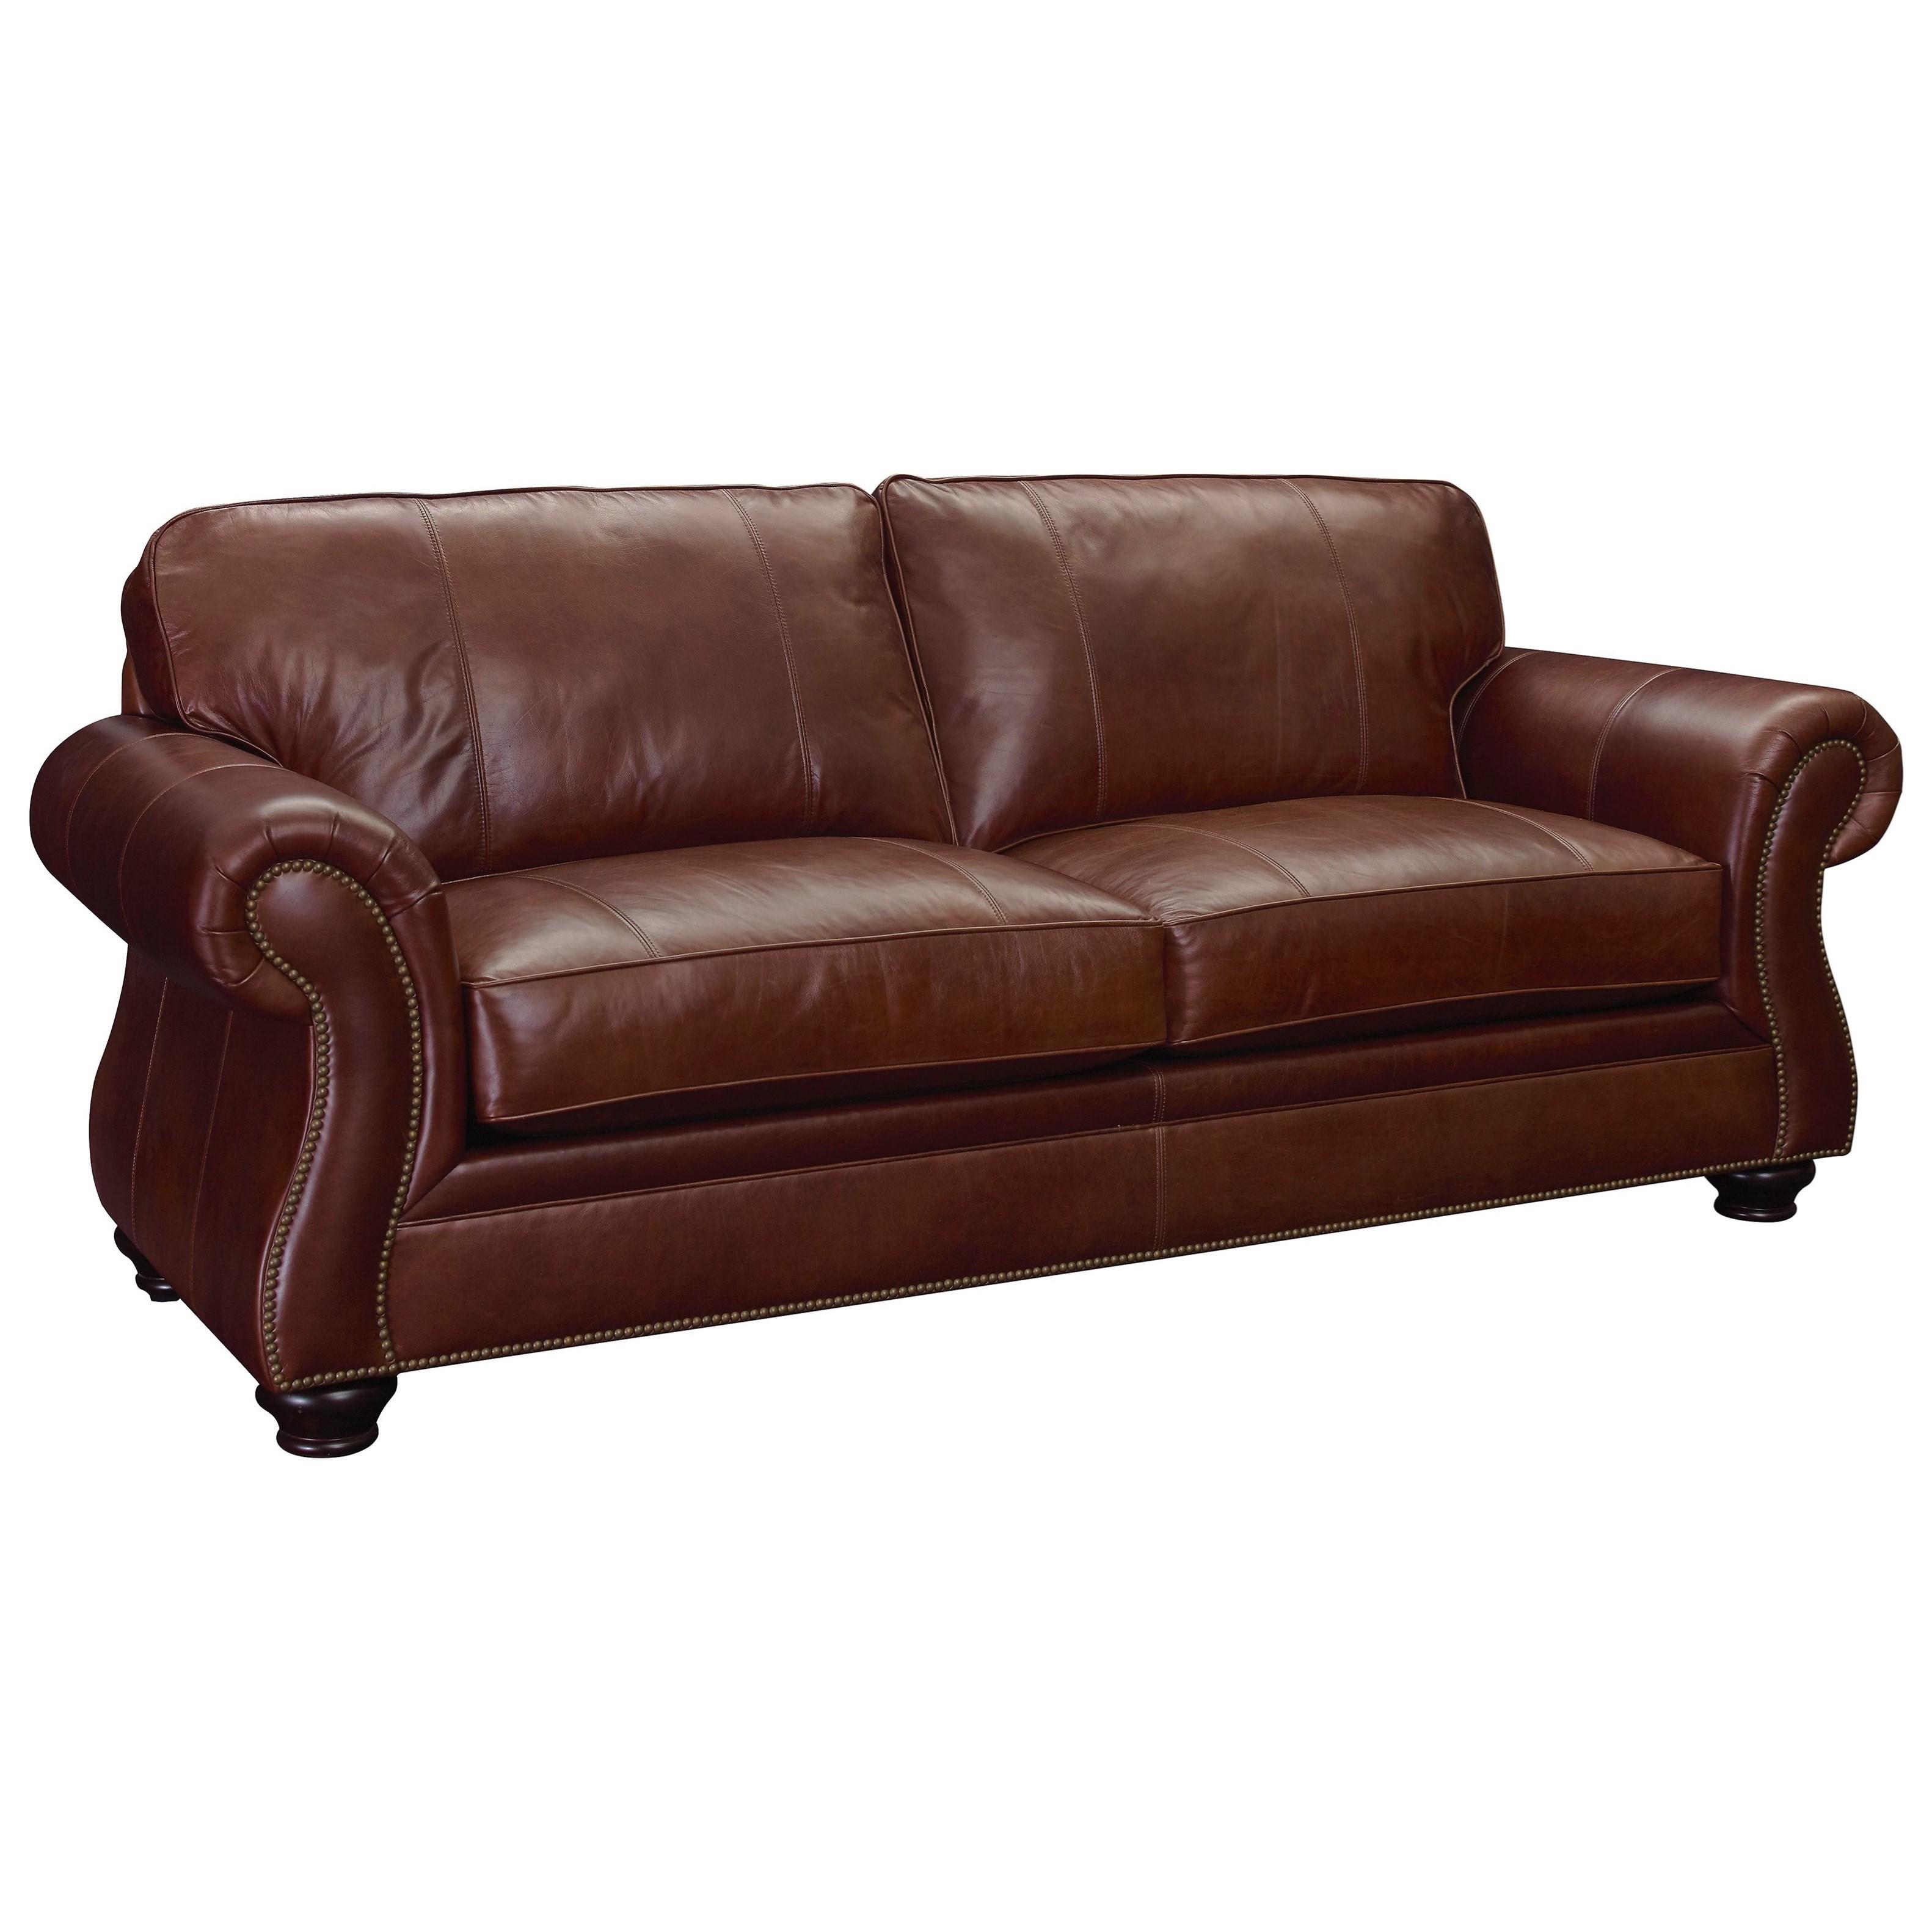 nailhead trim leather sofa set concepts cape town broyhill furniture laramie l5081 3